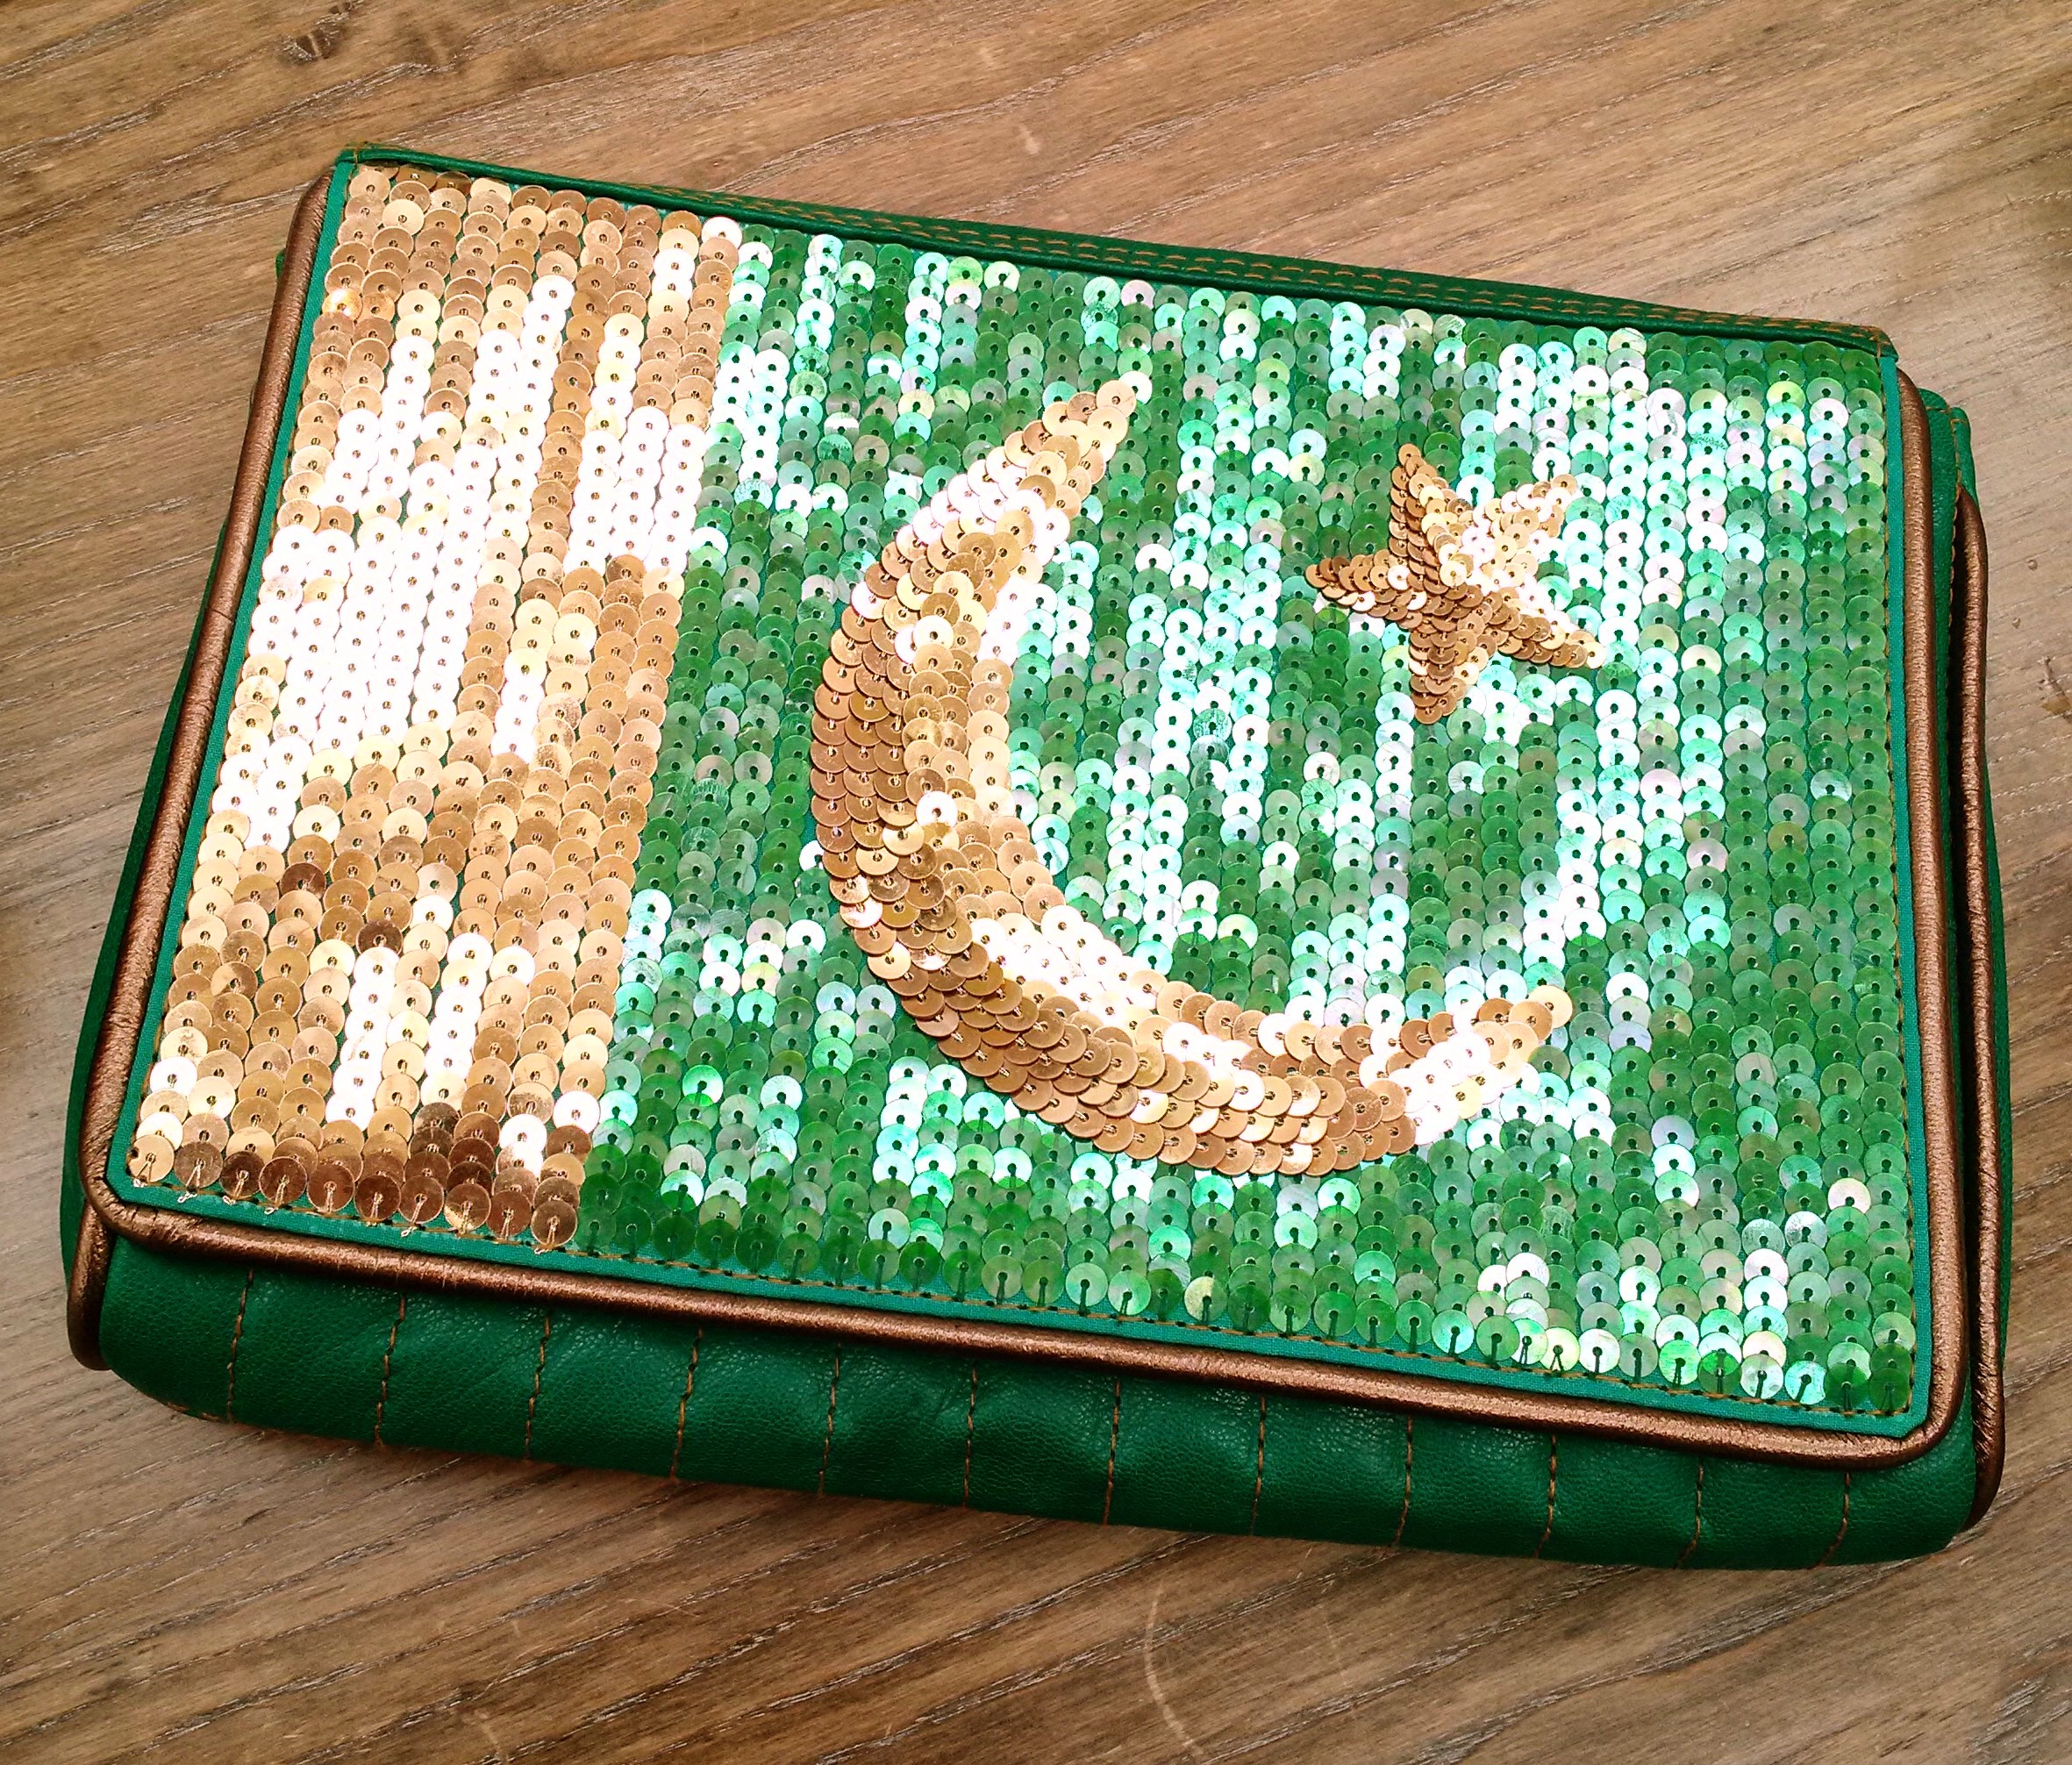 bag by Designer Mahin Hussain.